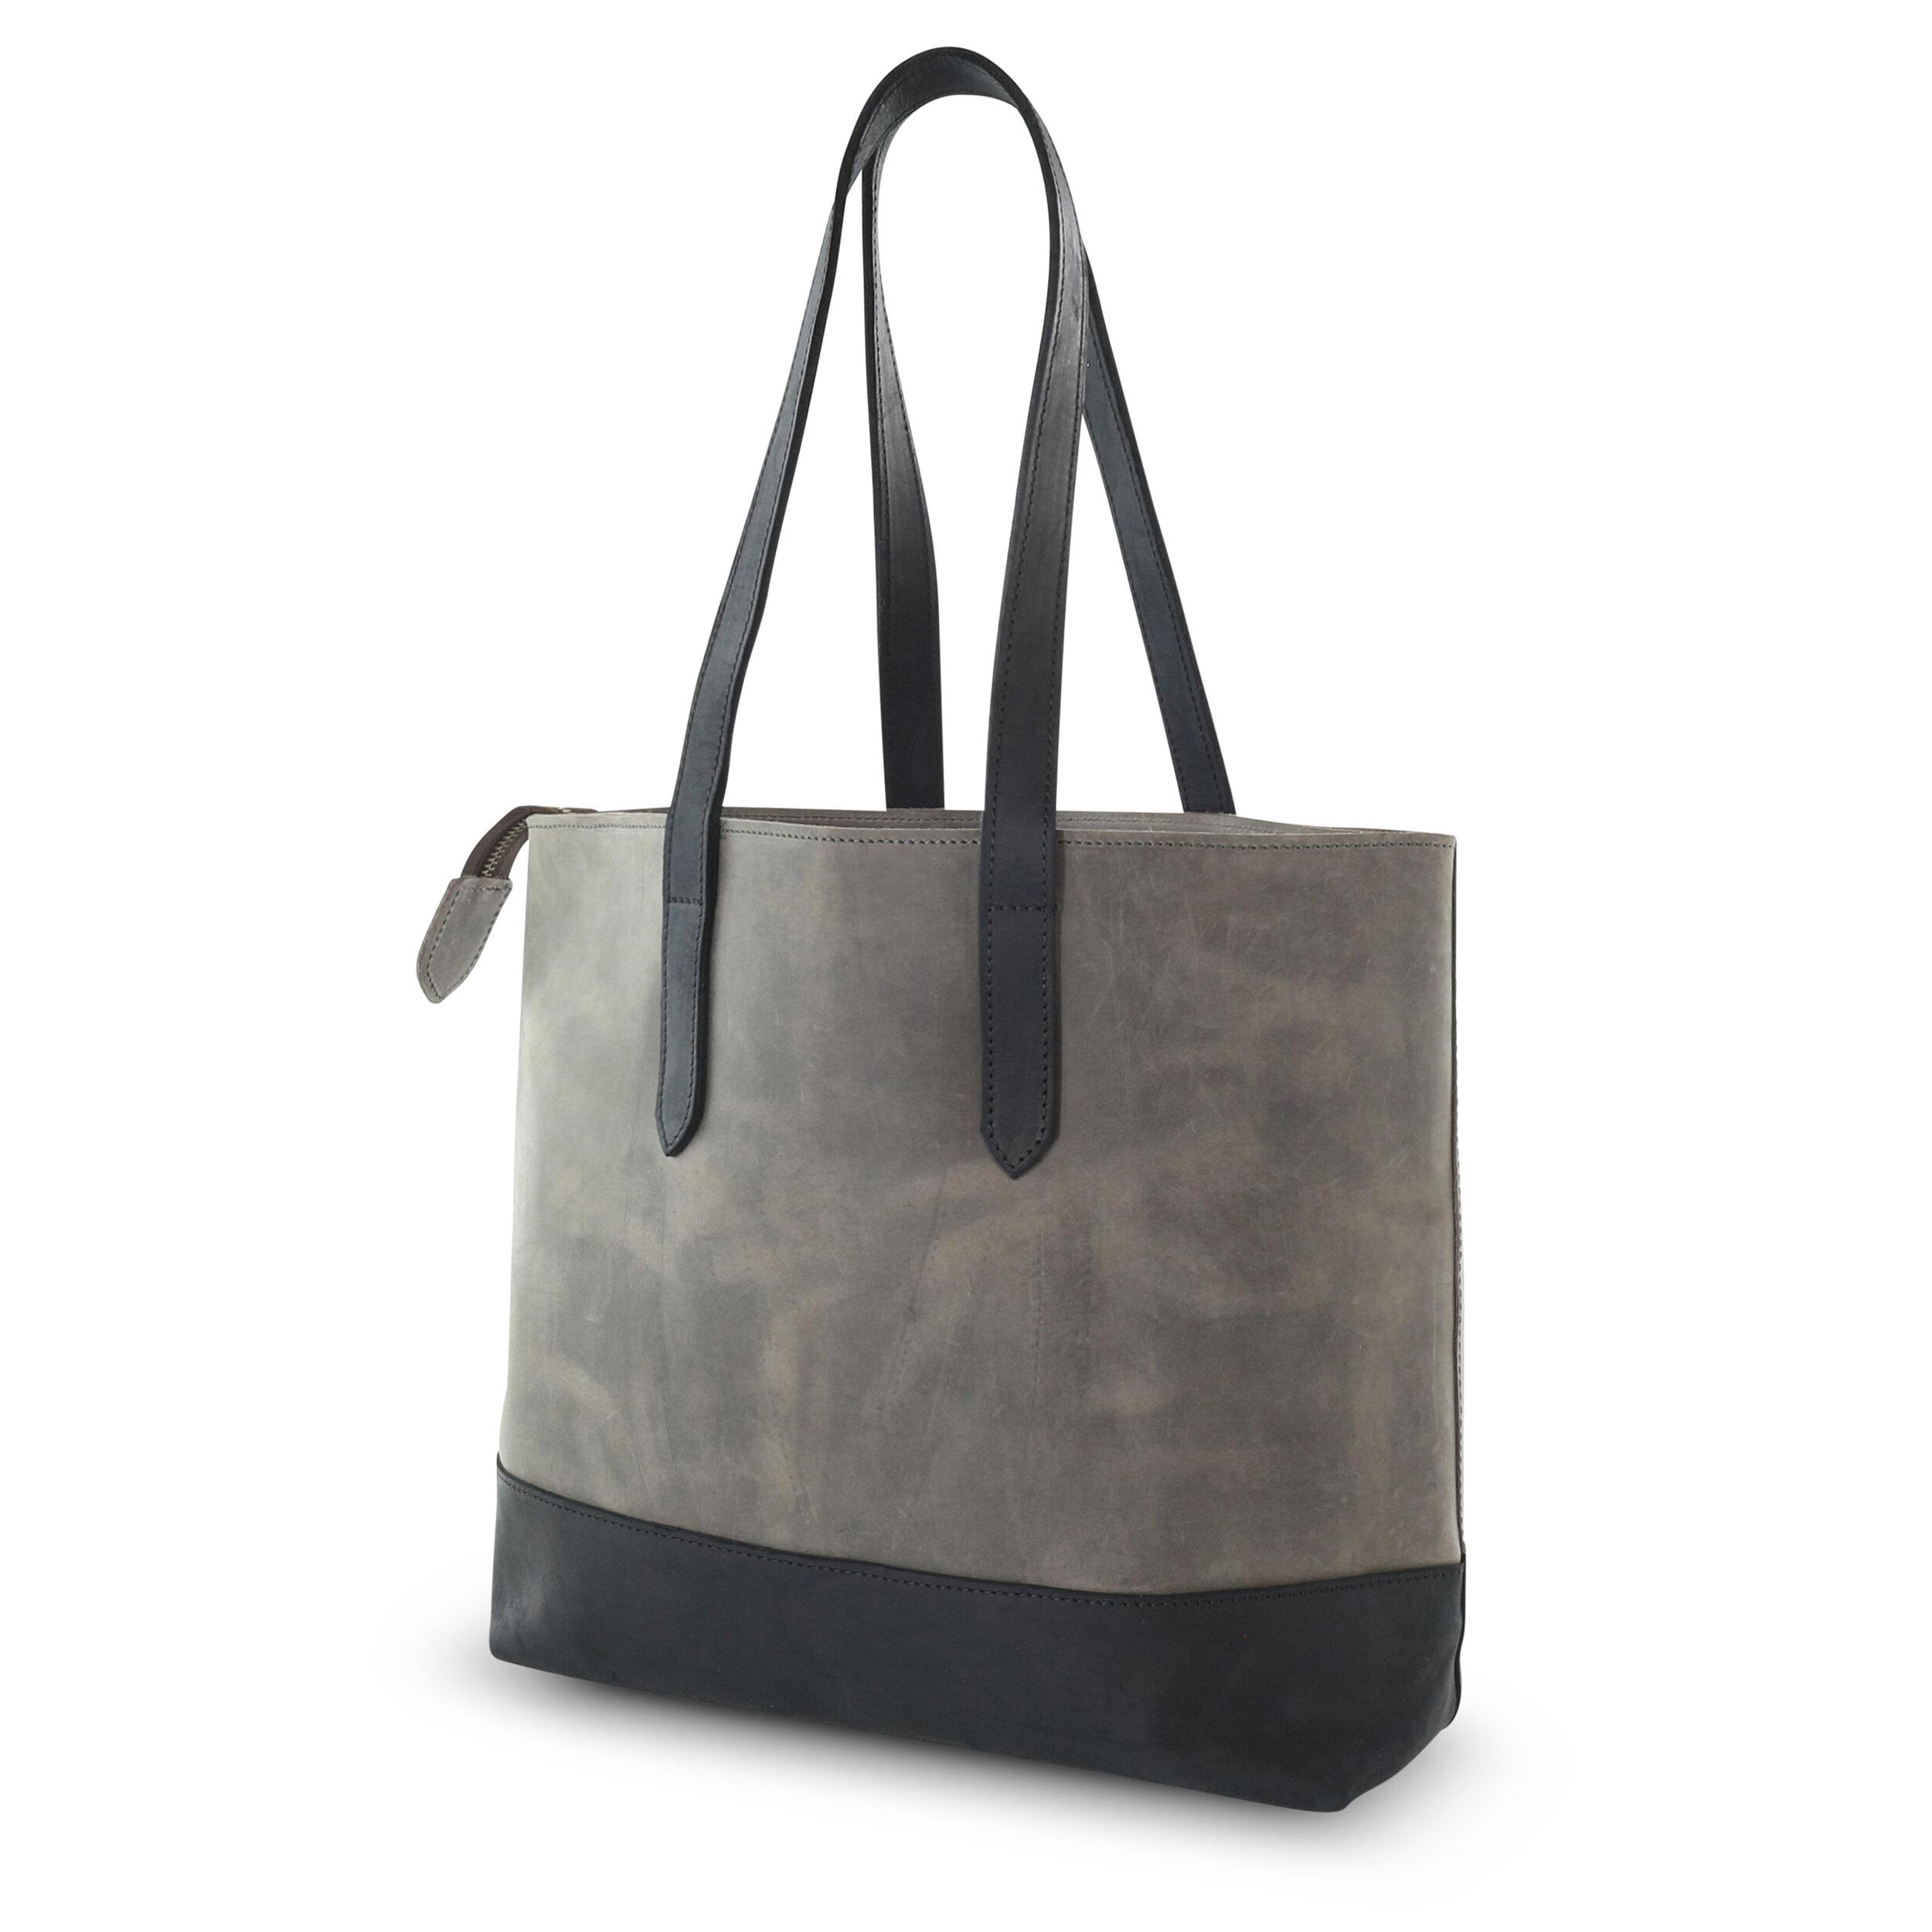 All leather tote handbag